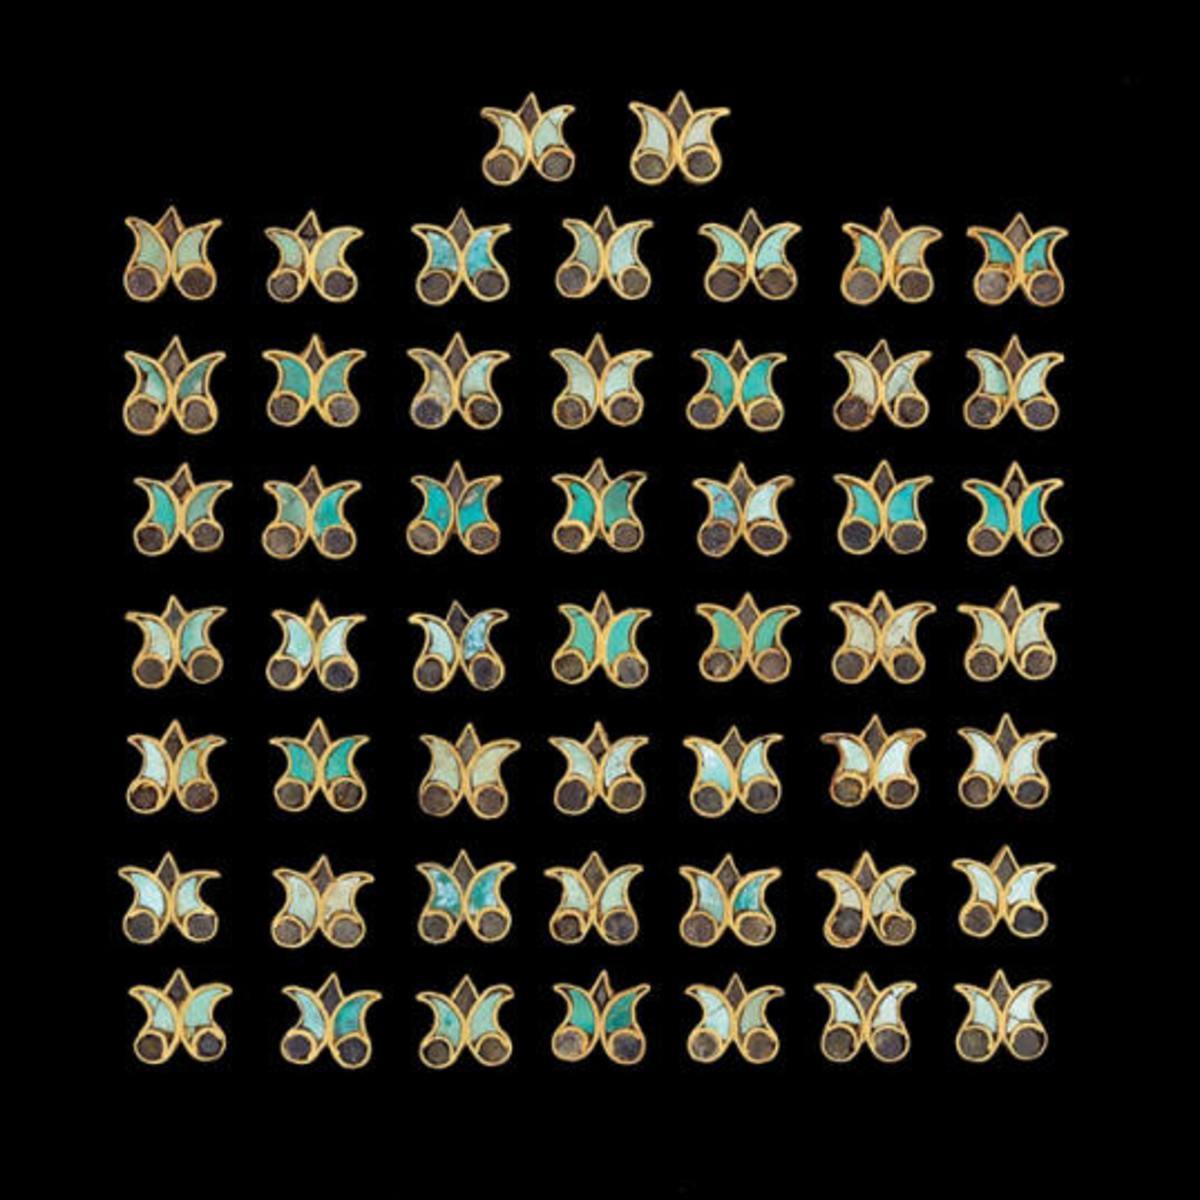 Appliqués in the shape of lotuses, 1st century CE. Image credit: Metropolitan Museum